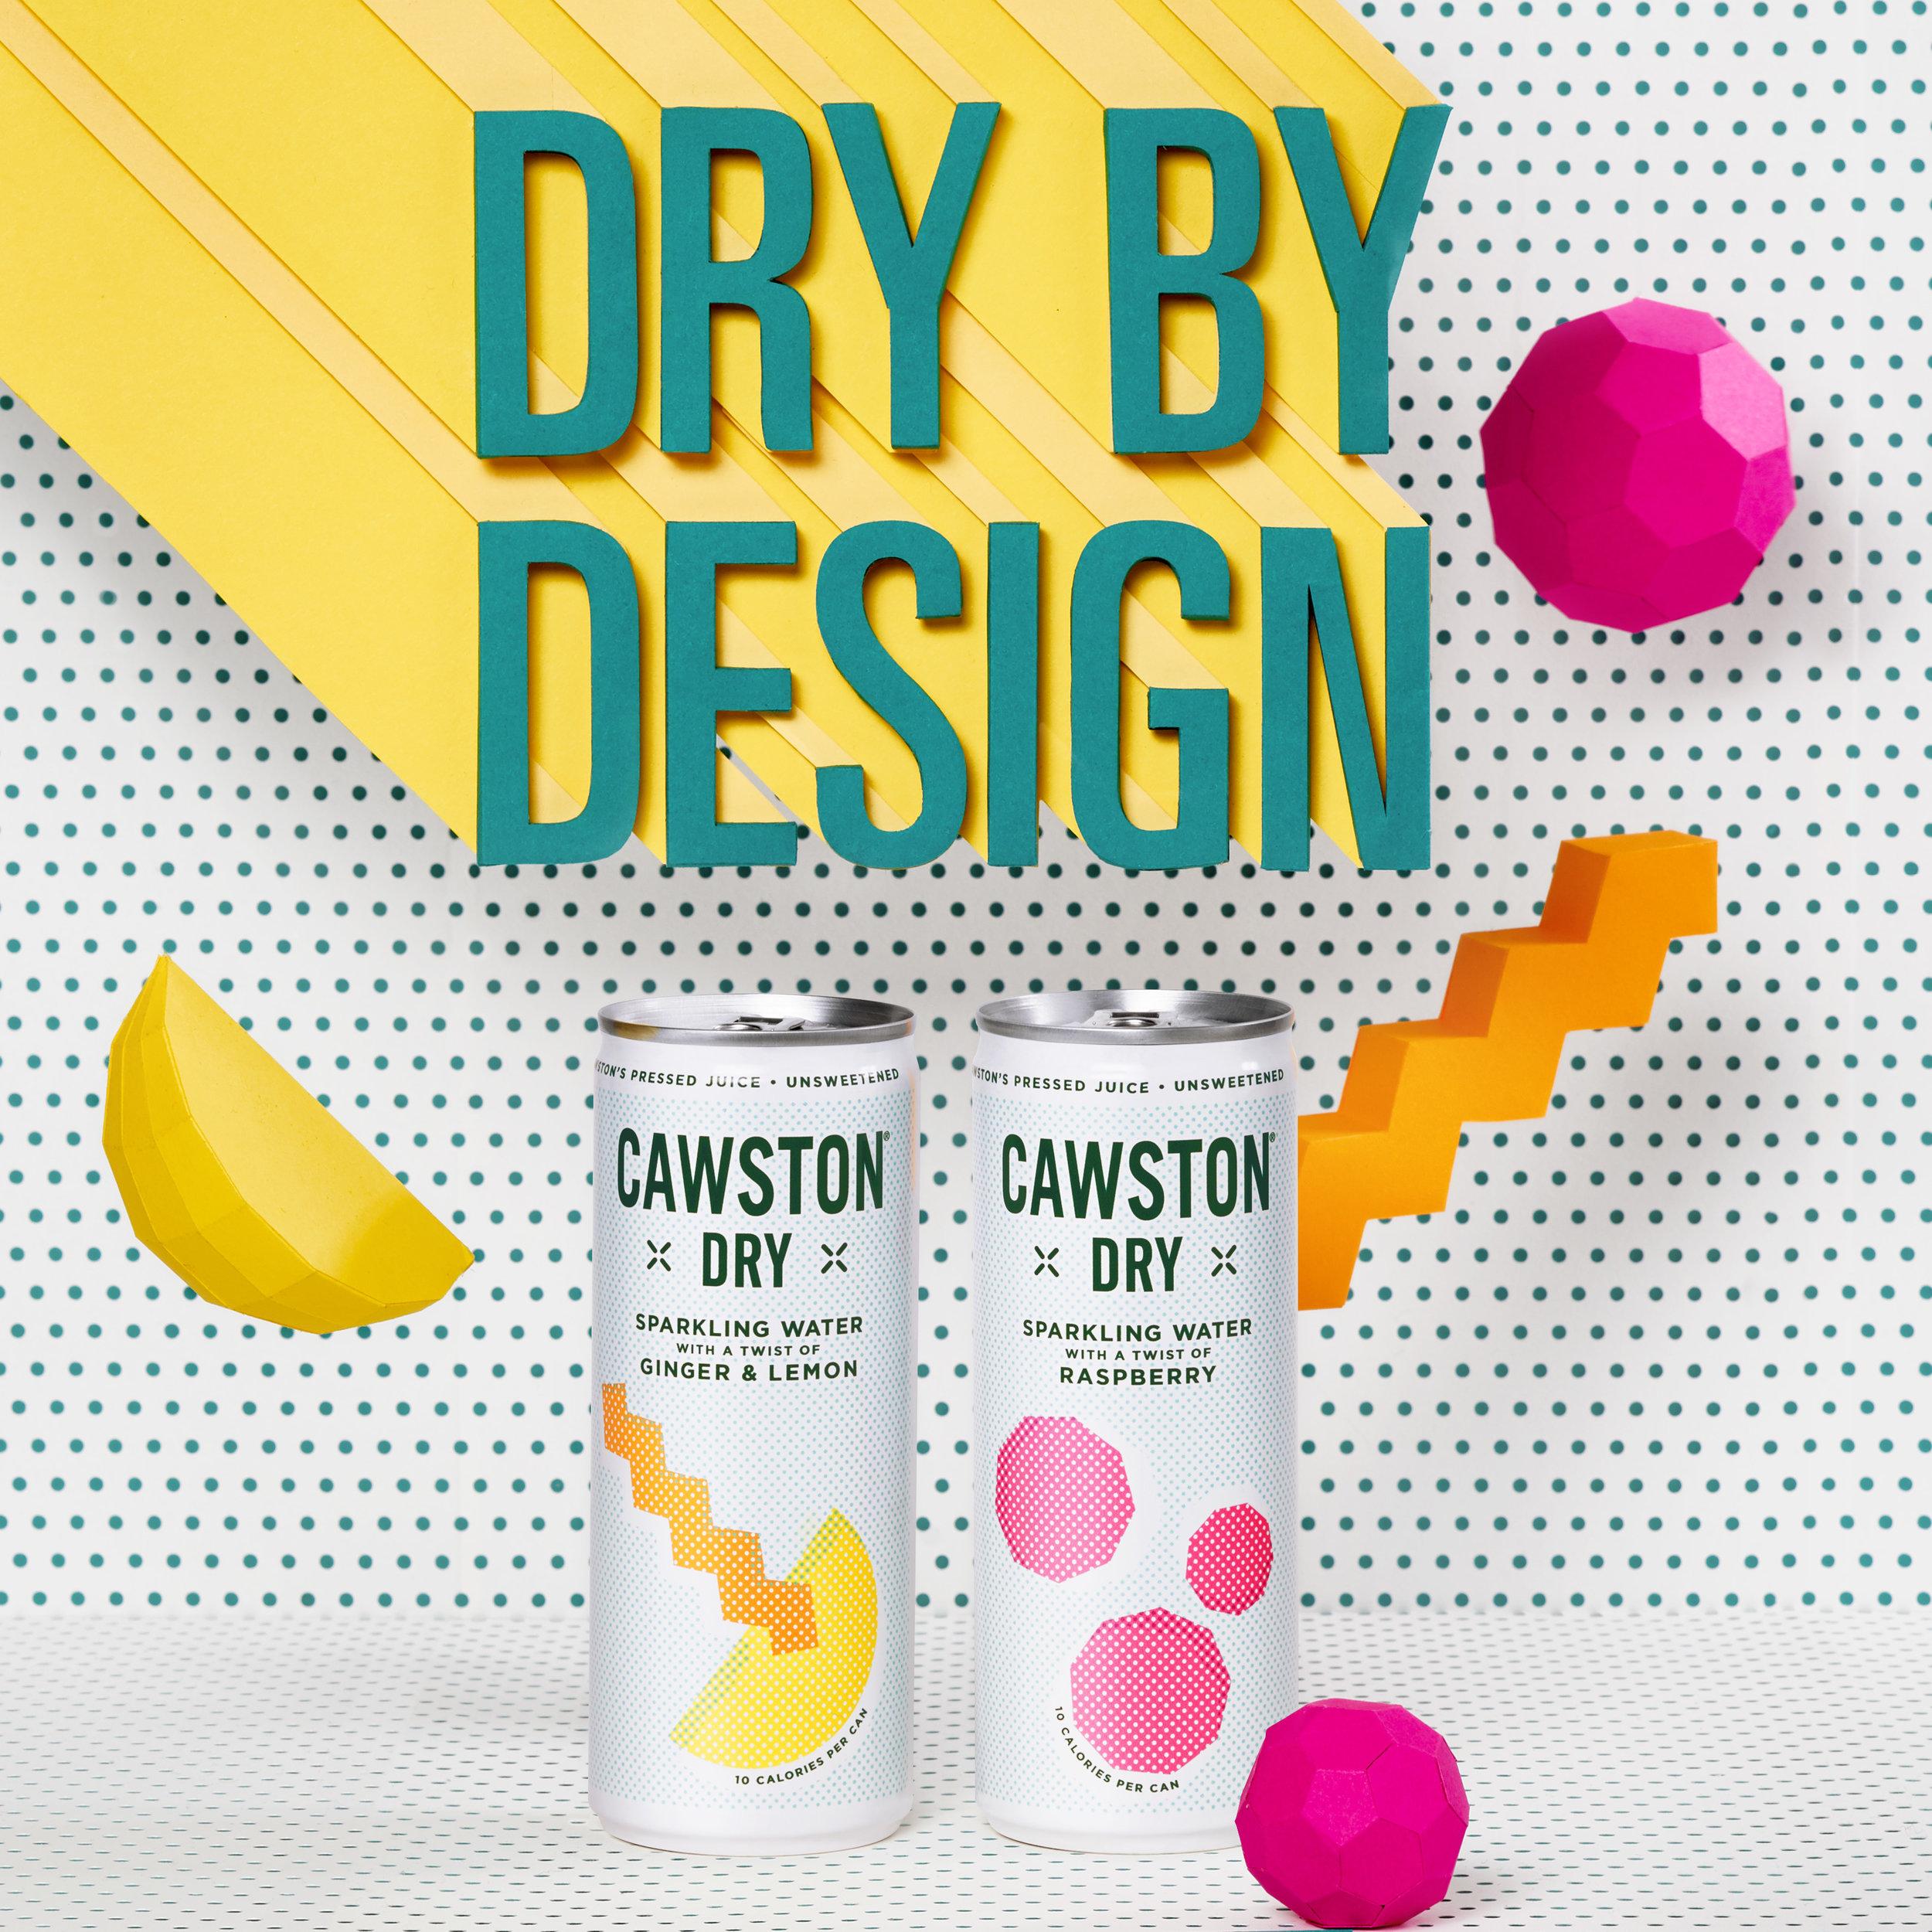 CawstonDry_Social_DRY.jpg